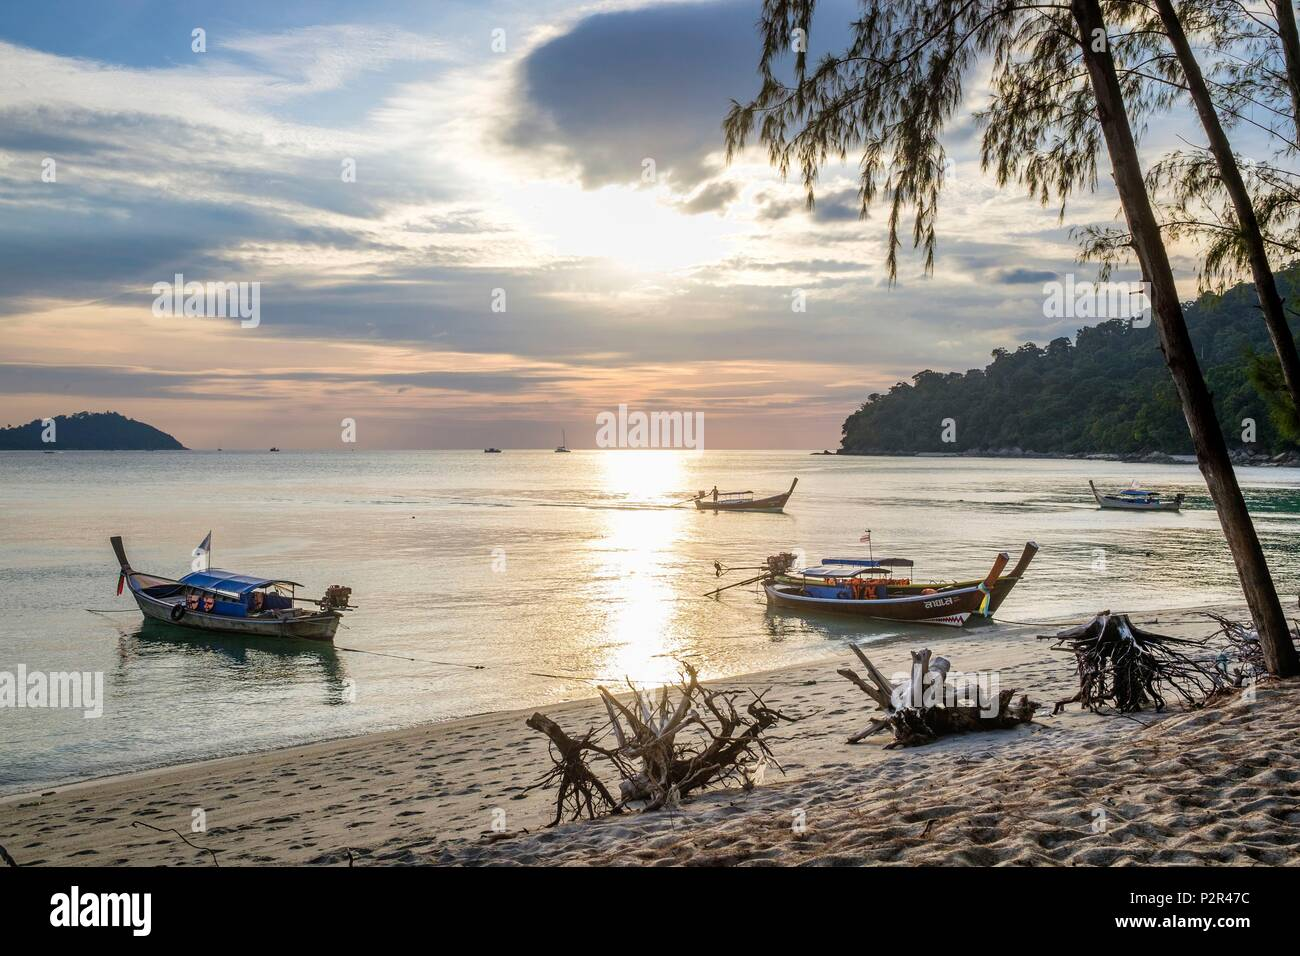 Thailand, Satun province, Tarutao National Marine Park, Ko Adang island, sunset on Laem Son beach - Stock Image